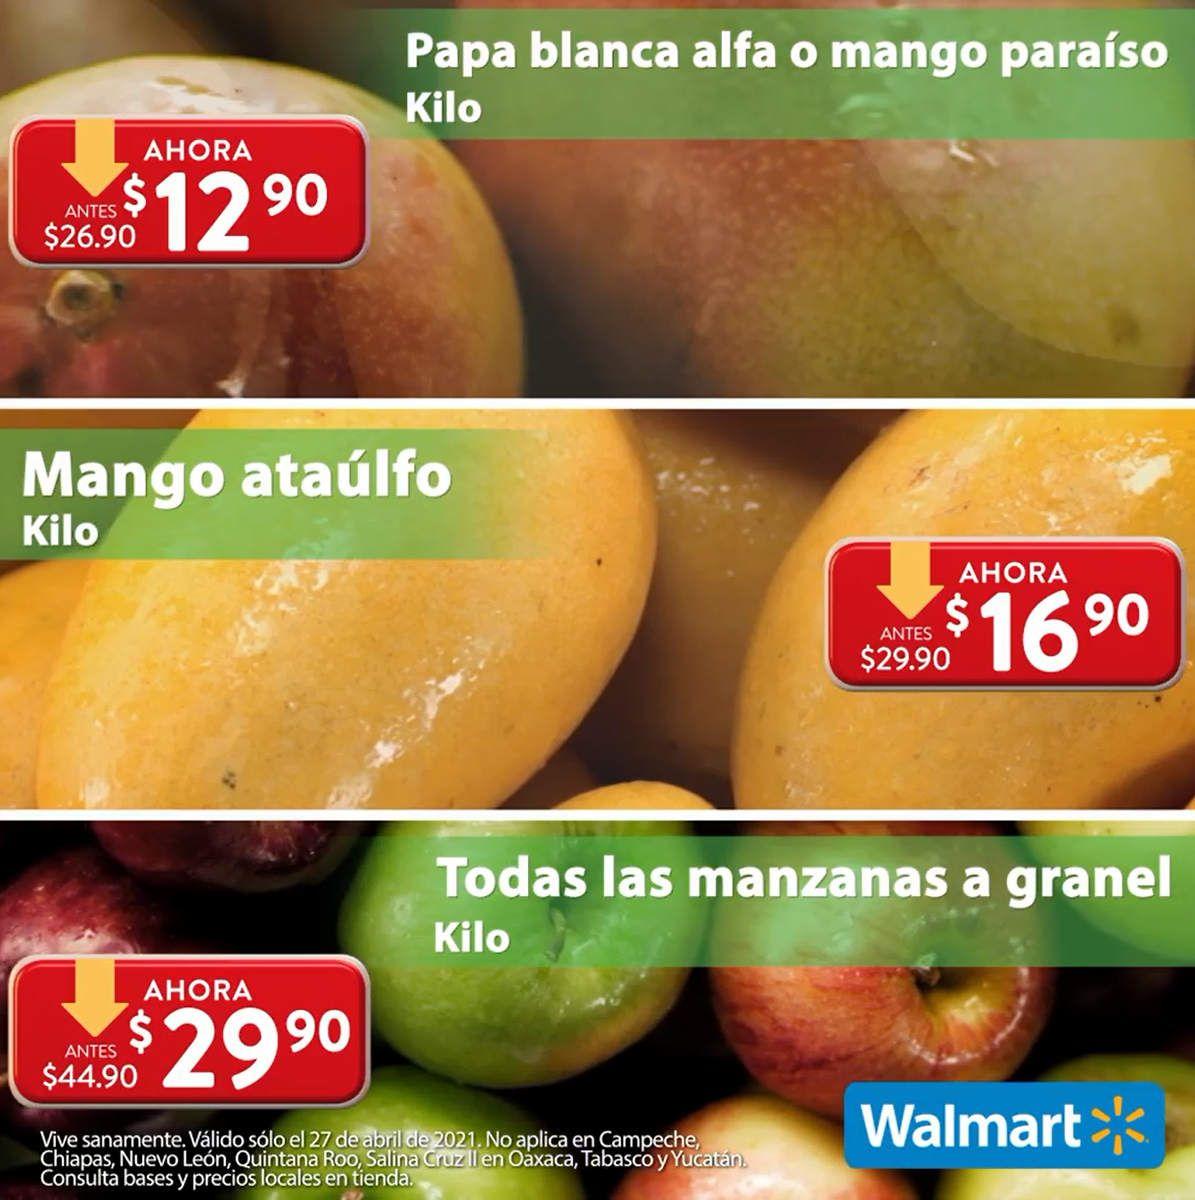 Walmart: Martes de Frescura 27 Abril: Mango Paraíso ó Papa $12.90 kg... Mango Ataulfo $16.90 kg... Todas las Manzanas a Granel $29.90 kg.